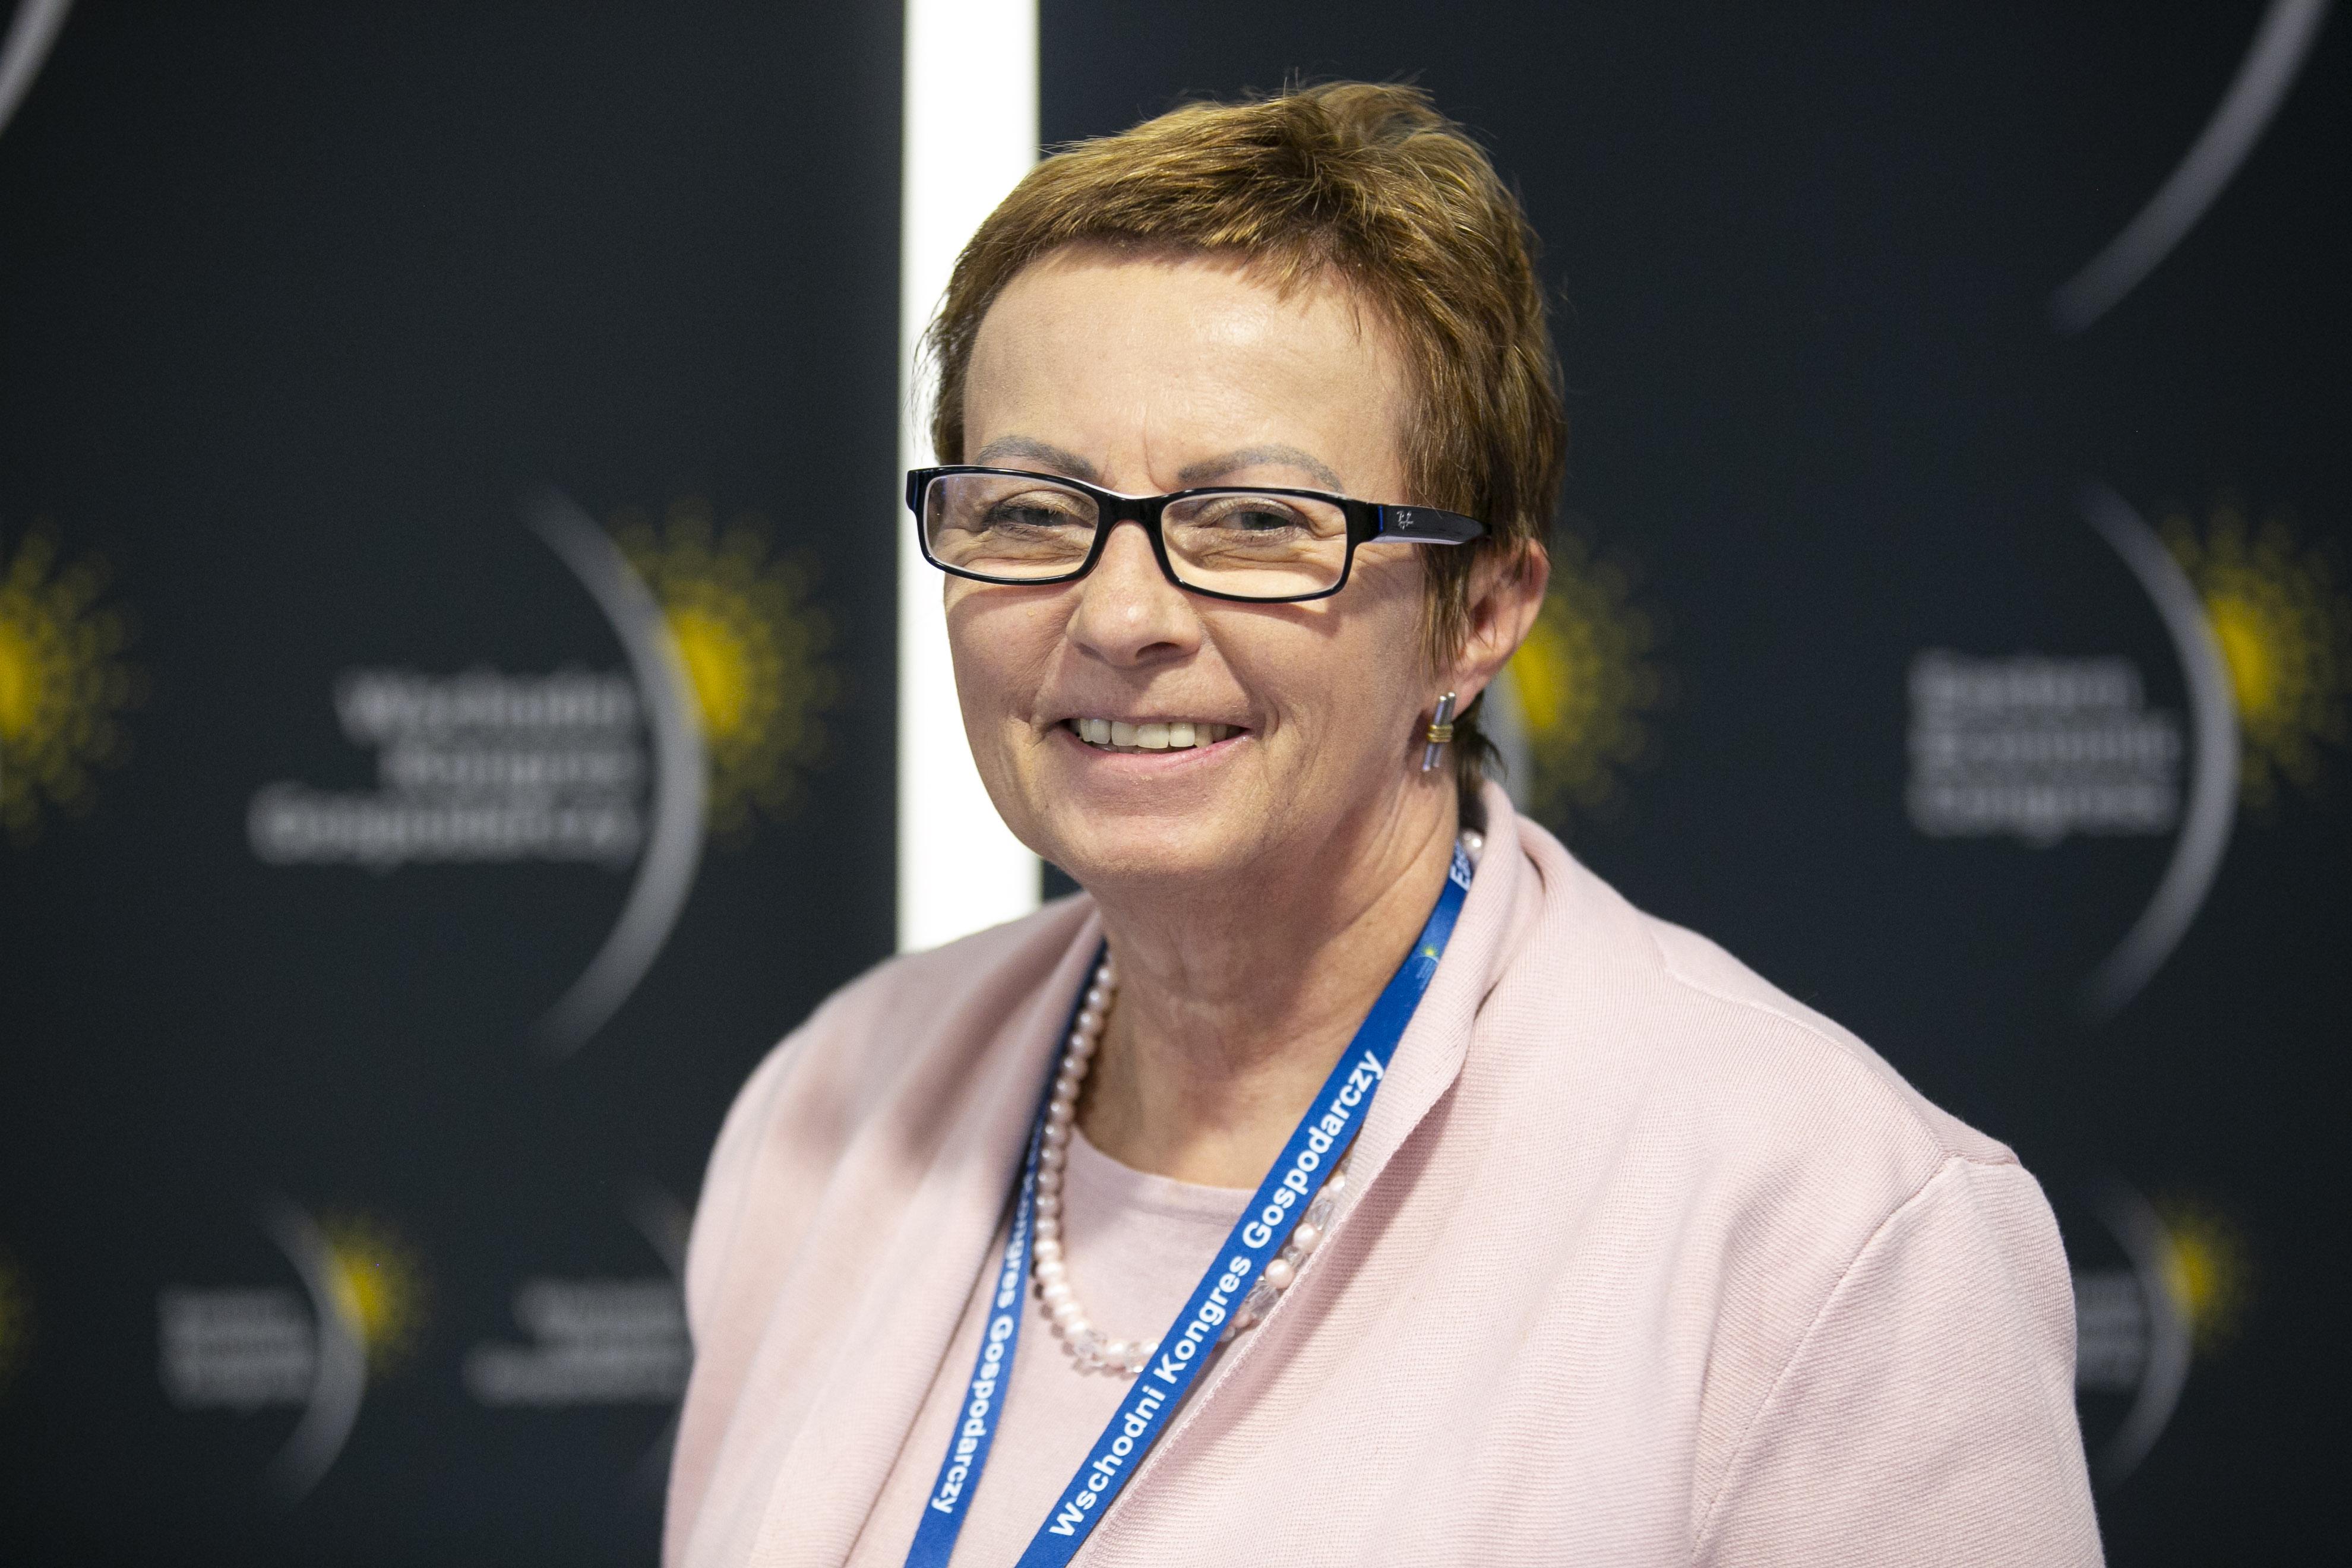 Alina Sarnacka, wiceprezes, wiceprezes fundacji Centrum PPP (fot. PTWP)